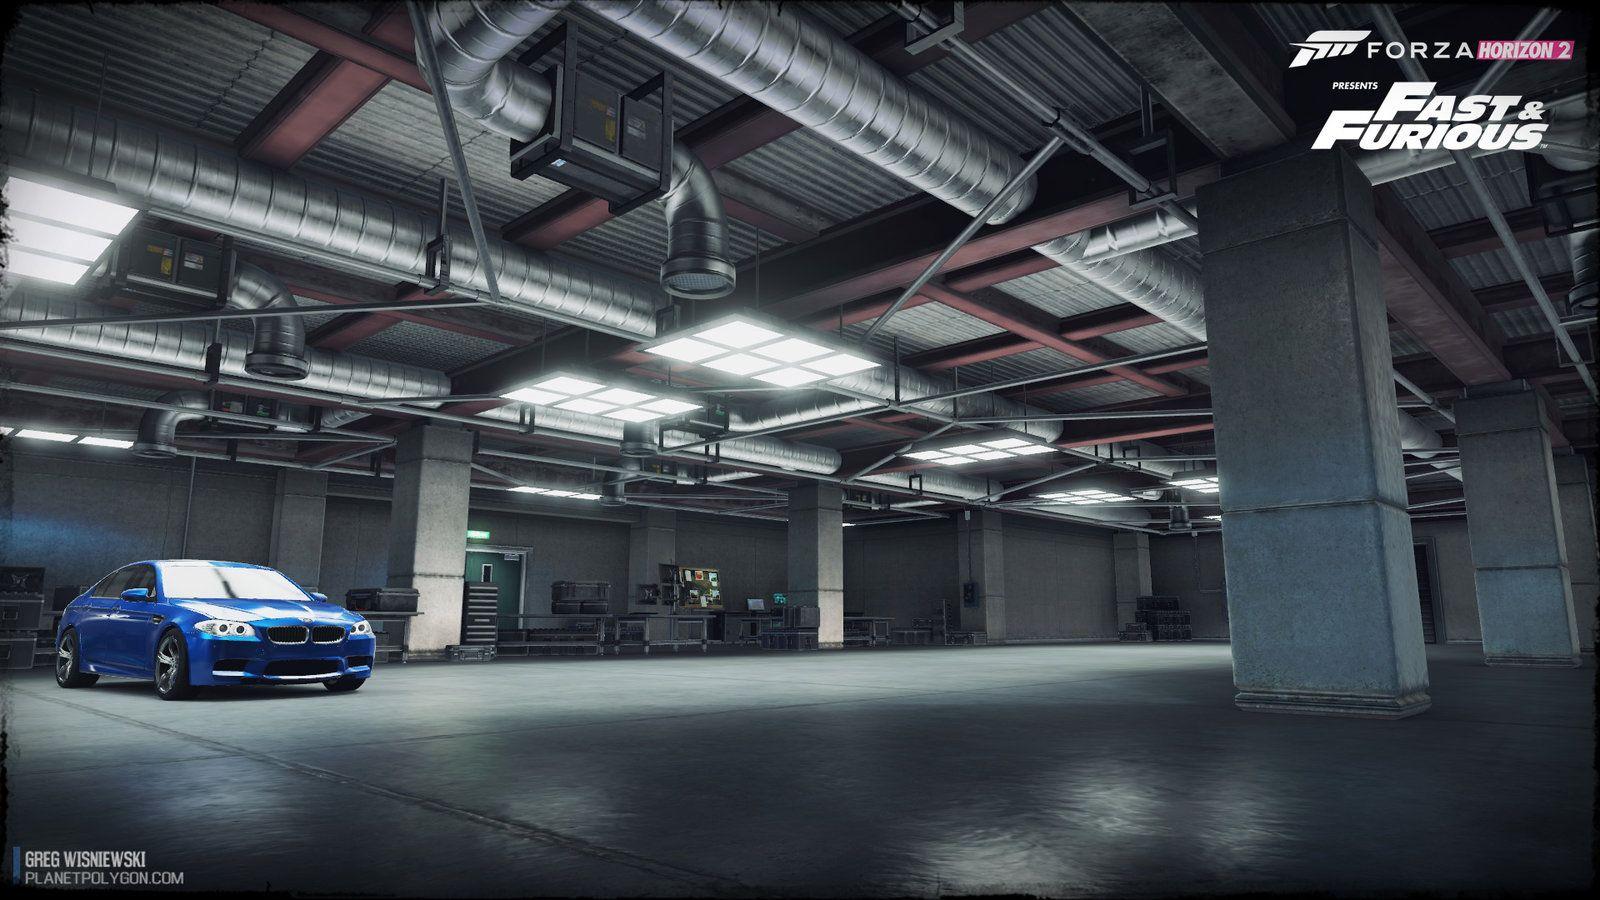 Forza Horizon 2 meets Fast & Furious 7, Greg Wisniewski on ArtStation at https://www.artstation.com/artwork/qQDxa